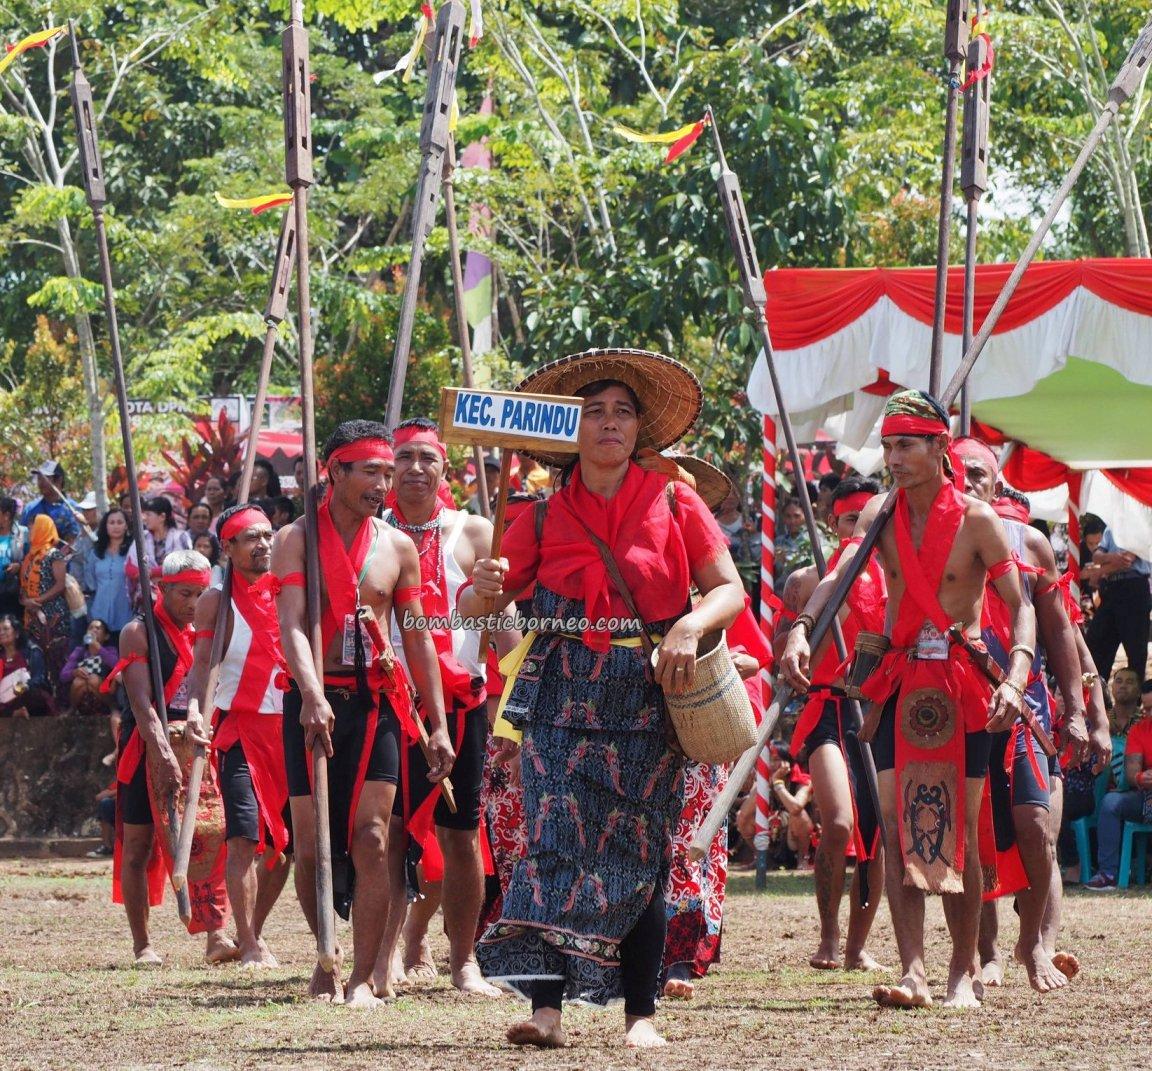 Gawai Dayak, paddy harvest festival, authentic, traditional, culture, Borneo, Indonesia, etnis, tribe, tribal, Tourism, cross border, 跨境婆罗洲游踪, 印尼西加里曼丹, 传统达雅克丰收节日